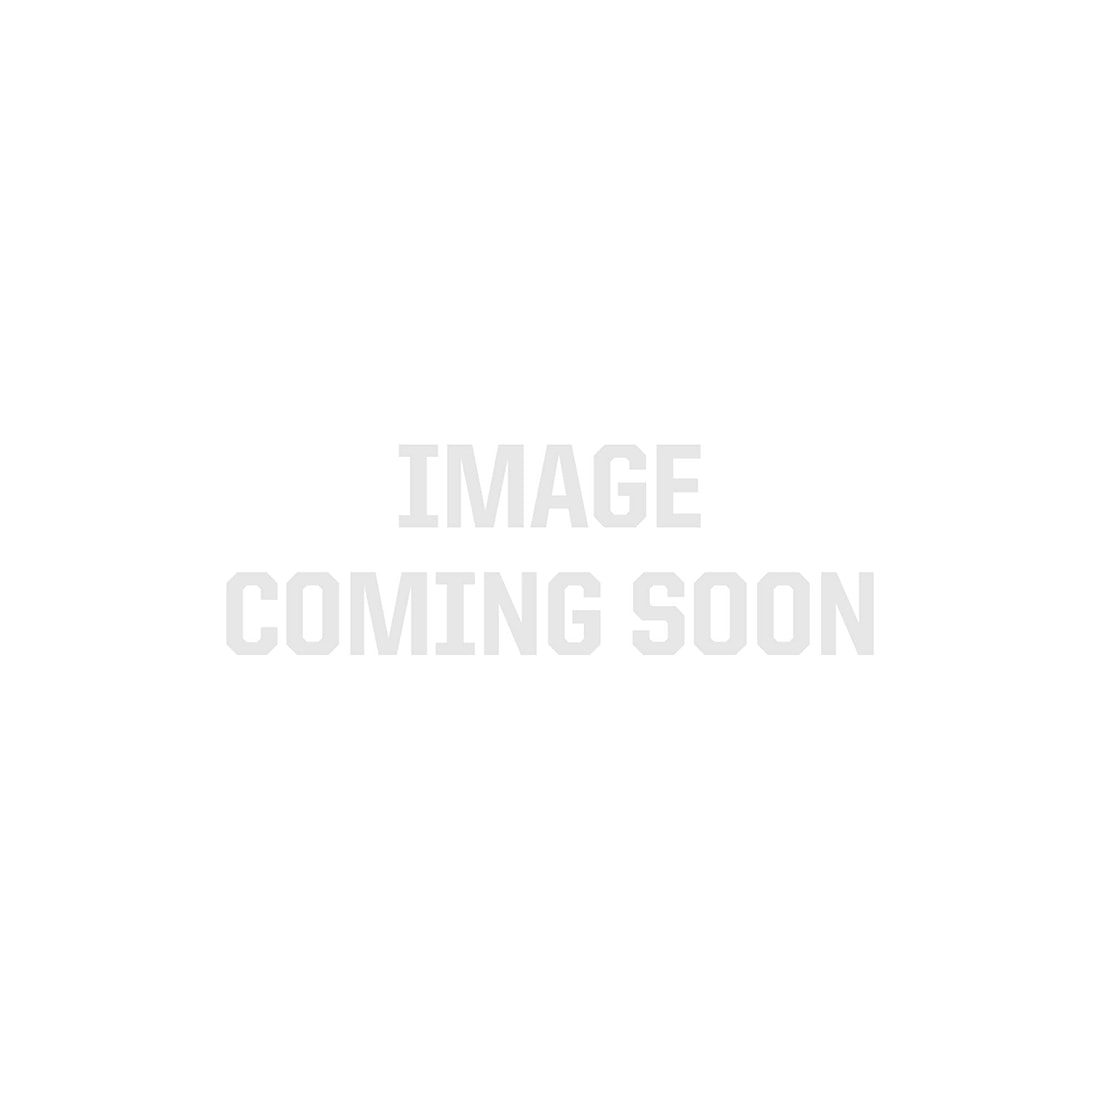 Soft White 5630 Single Row CurrentControl LED Strip Light, 70/m, 5.1mm wide, Sample Kit